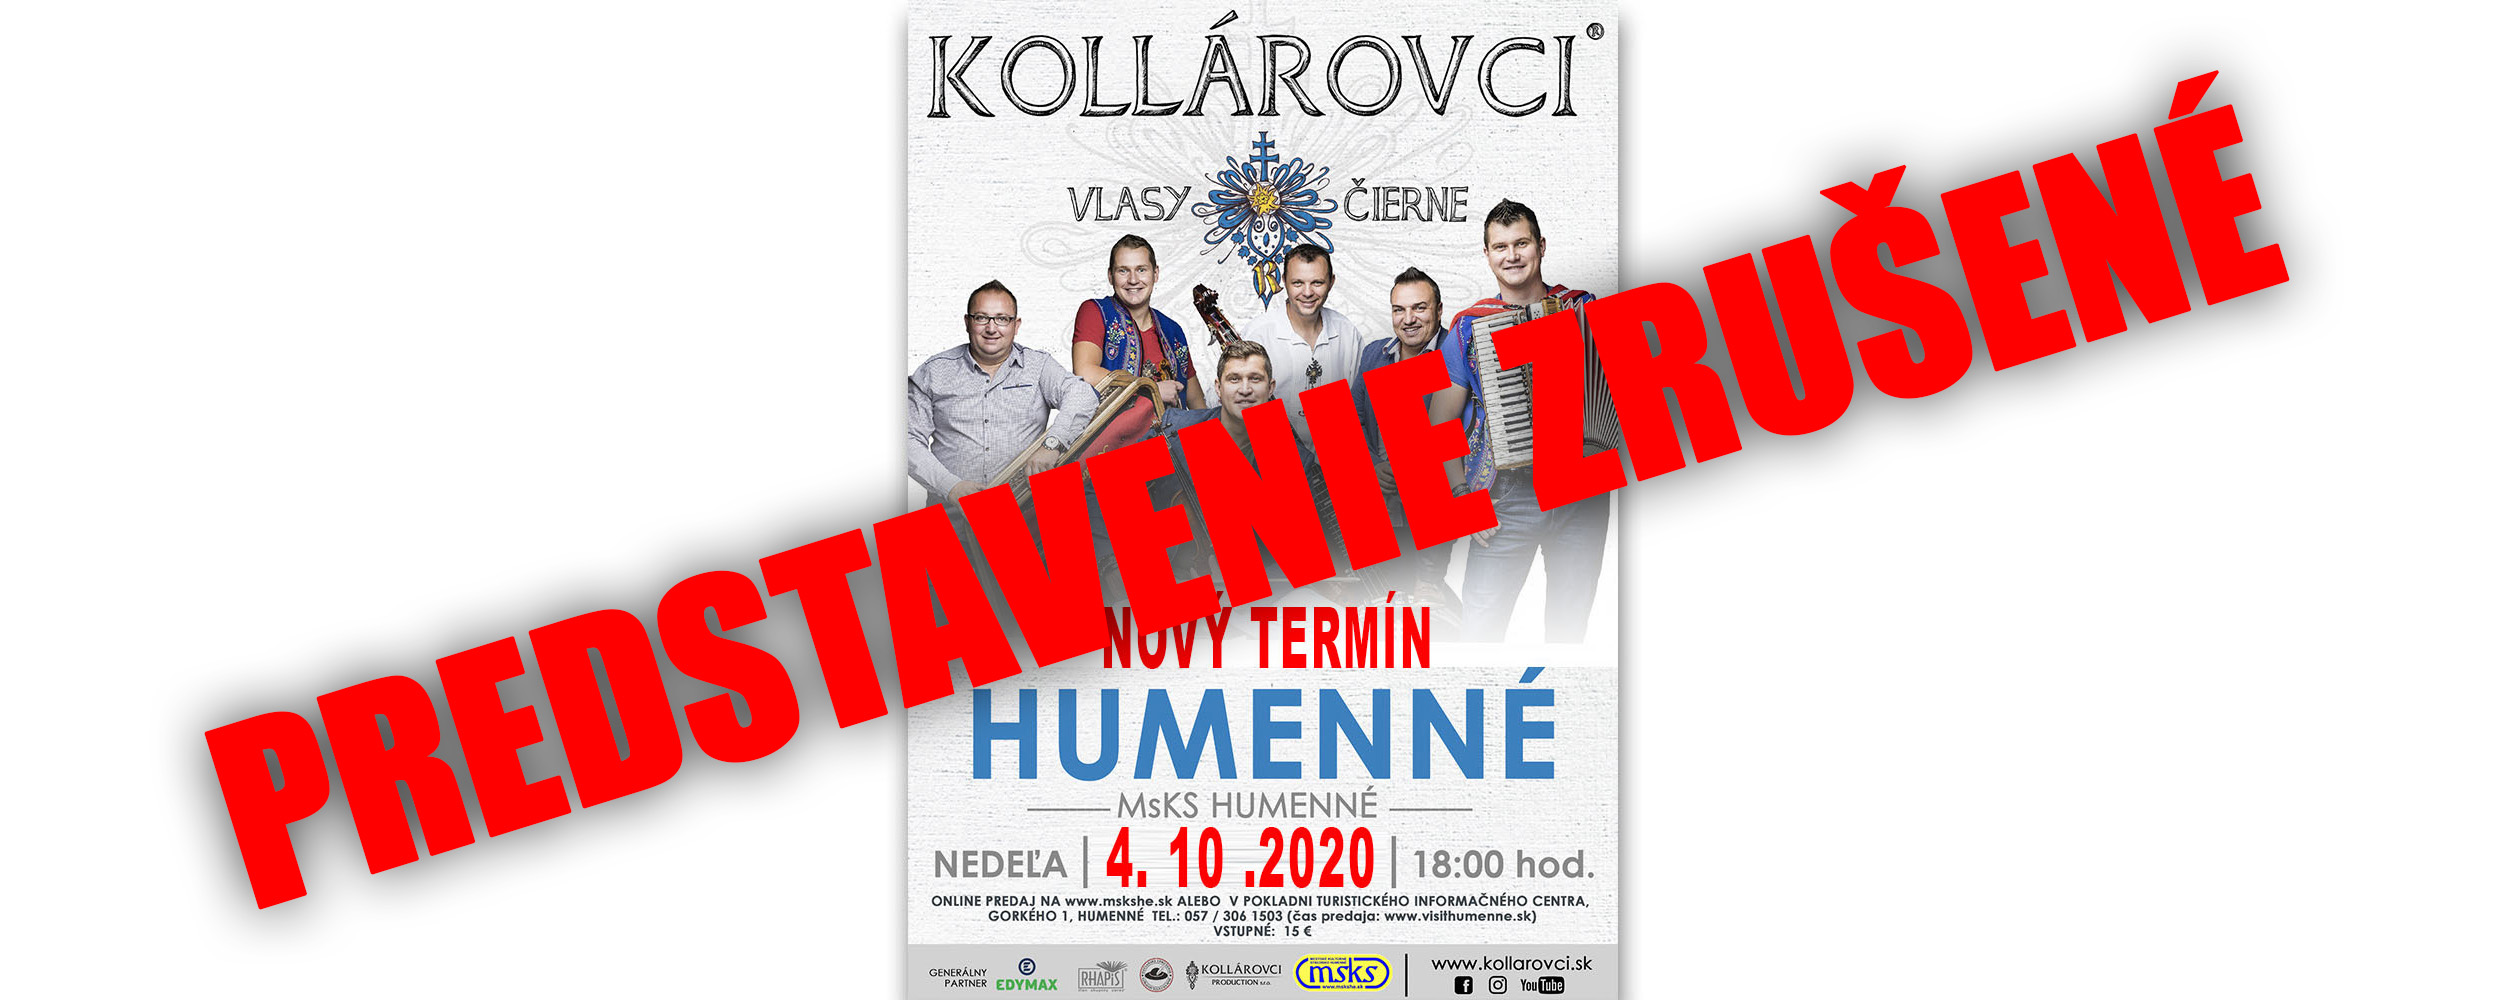 Kollarovci Novy Termin 2